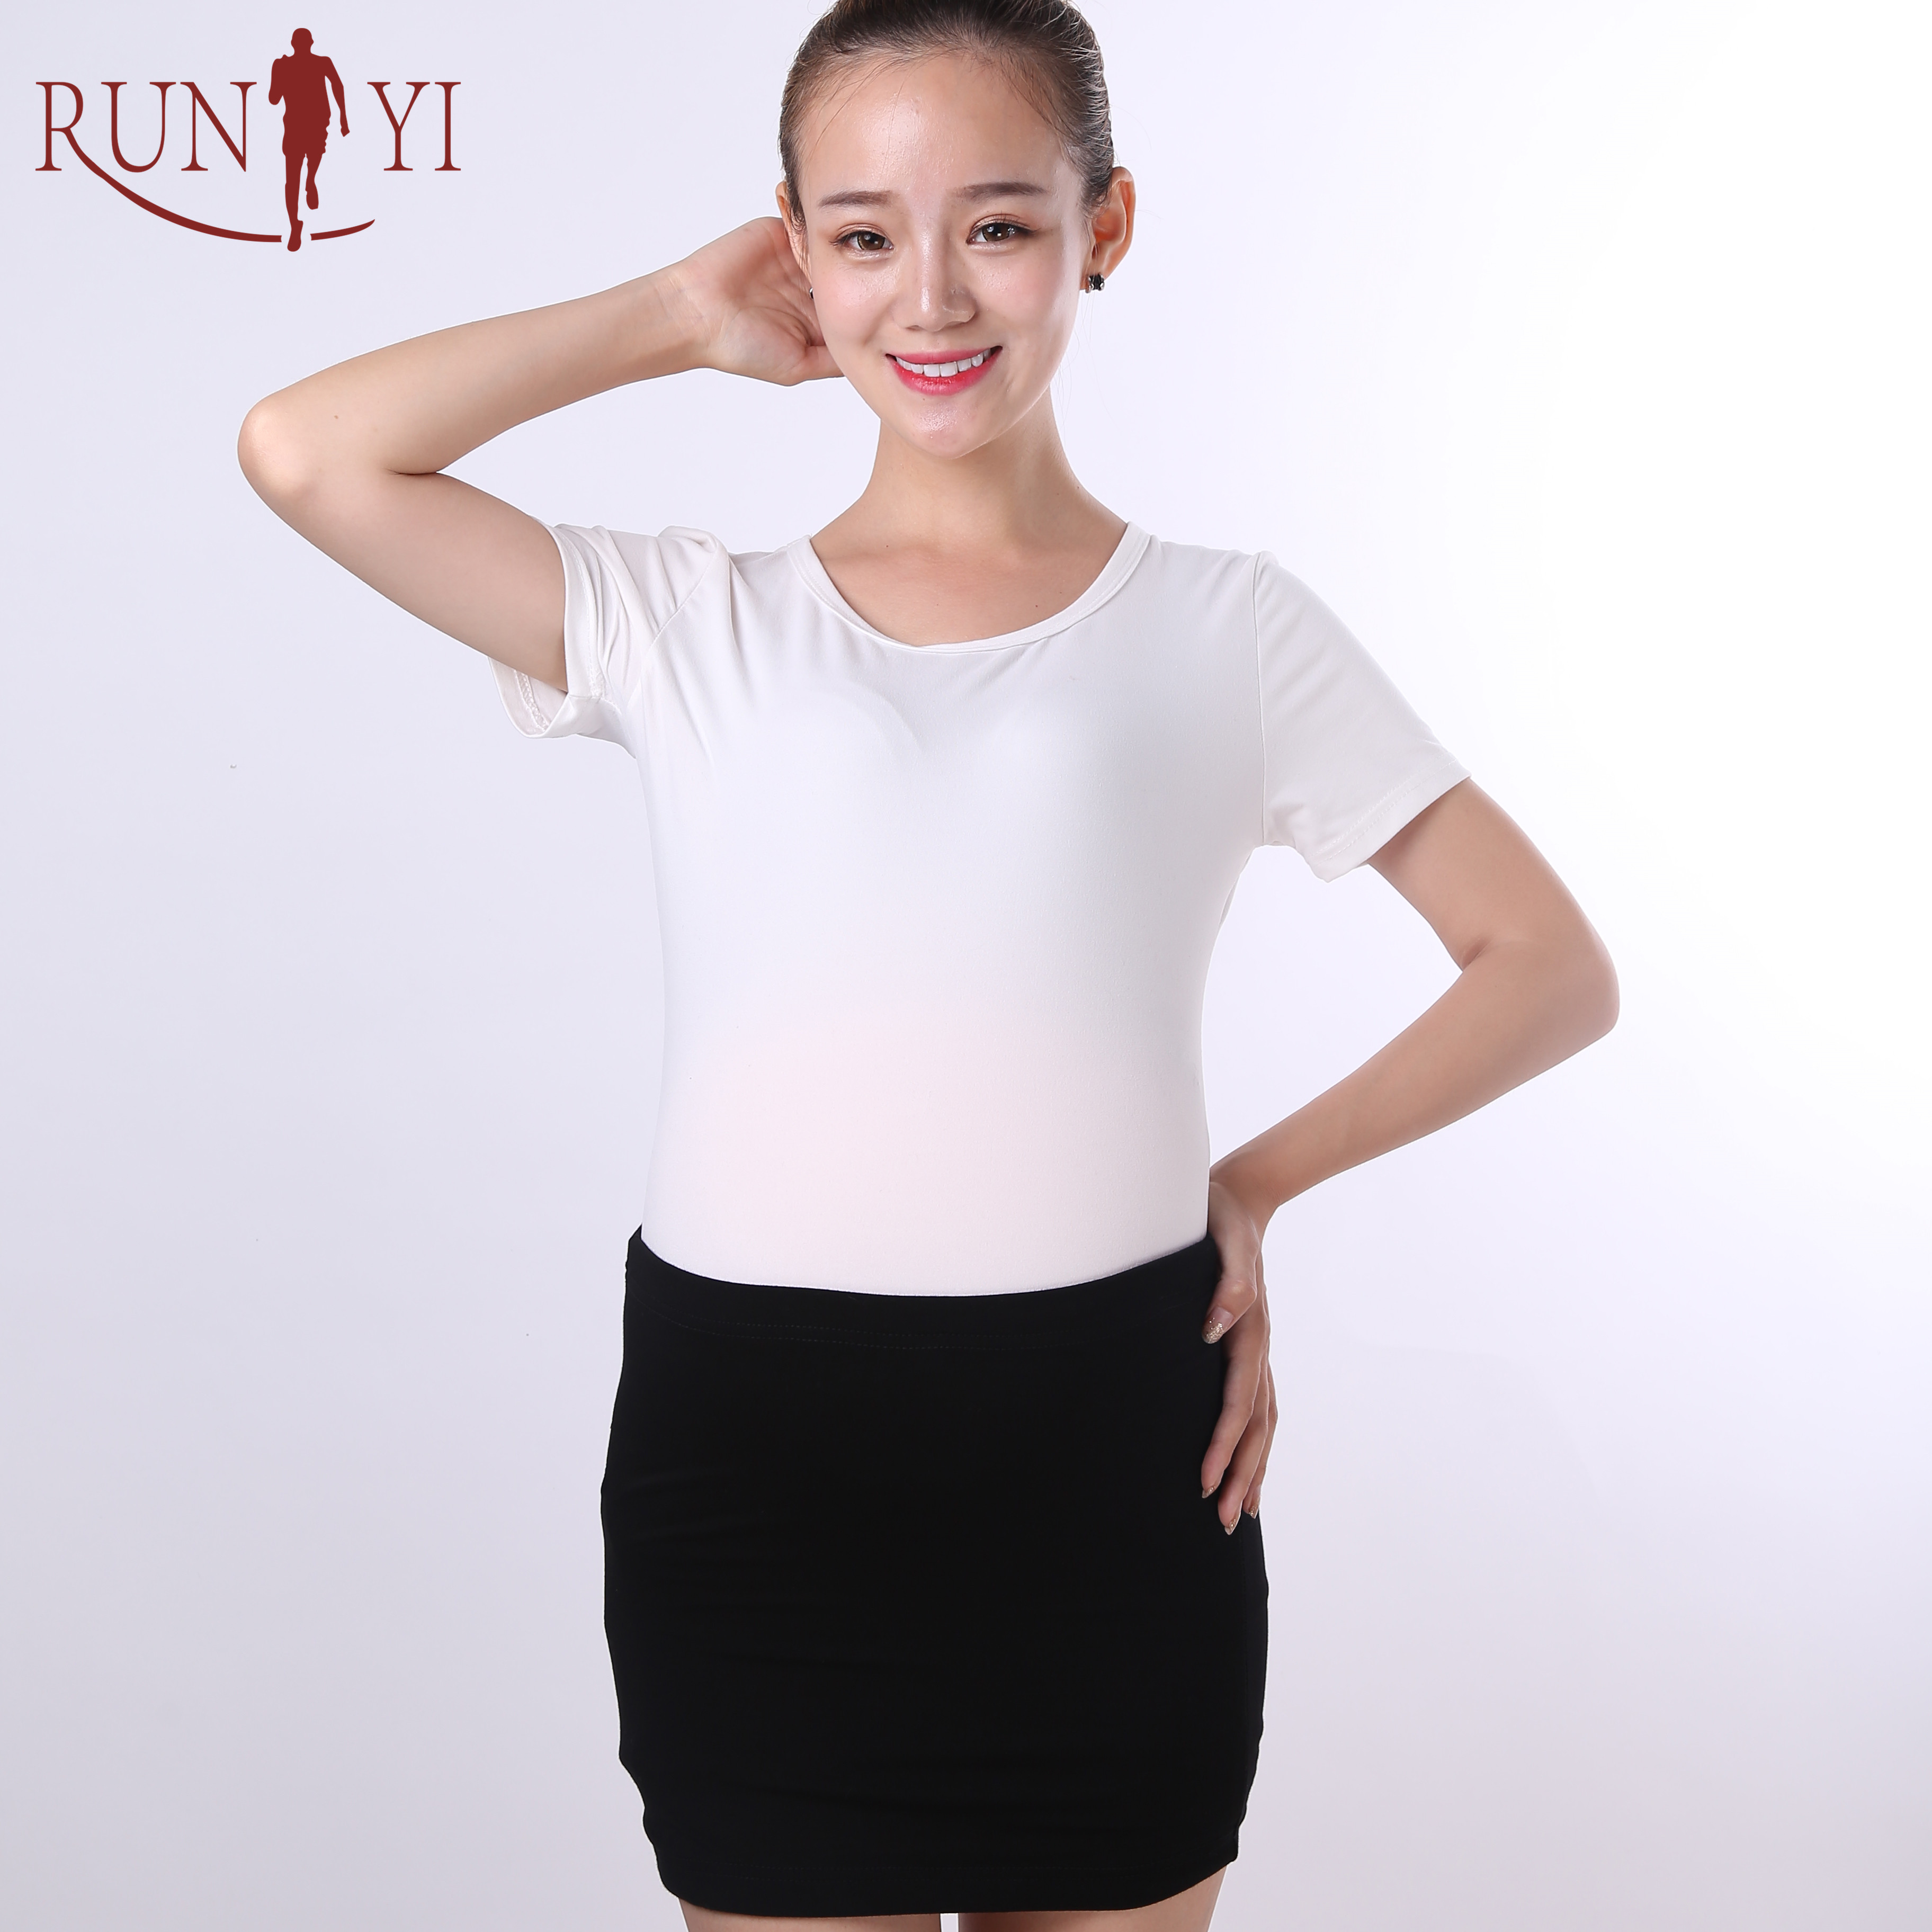 9ef98b169e5ea China Anti-radiation Clothes, China Anti-radiation Clothes Manufacturers  and Suppliers on Alibaba.com